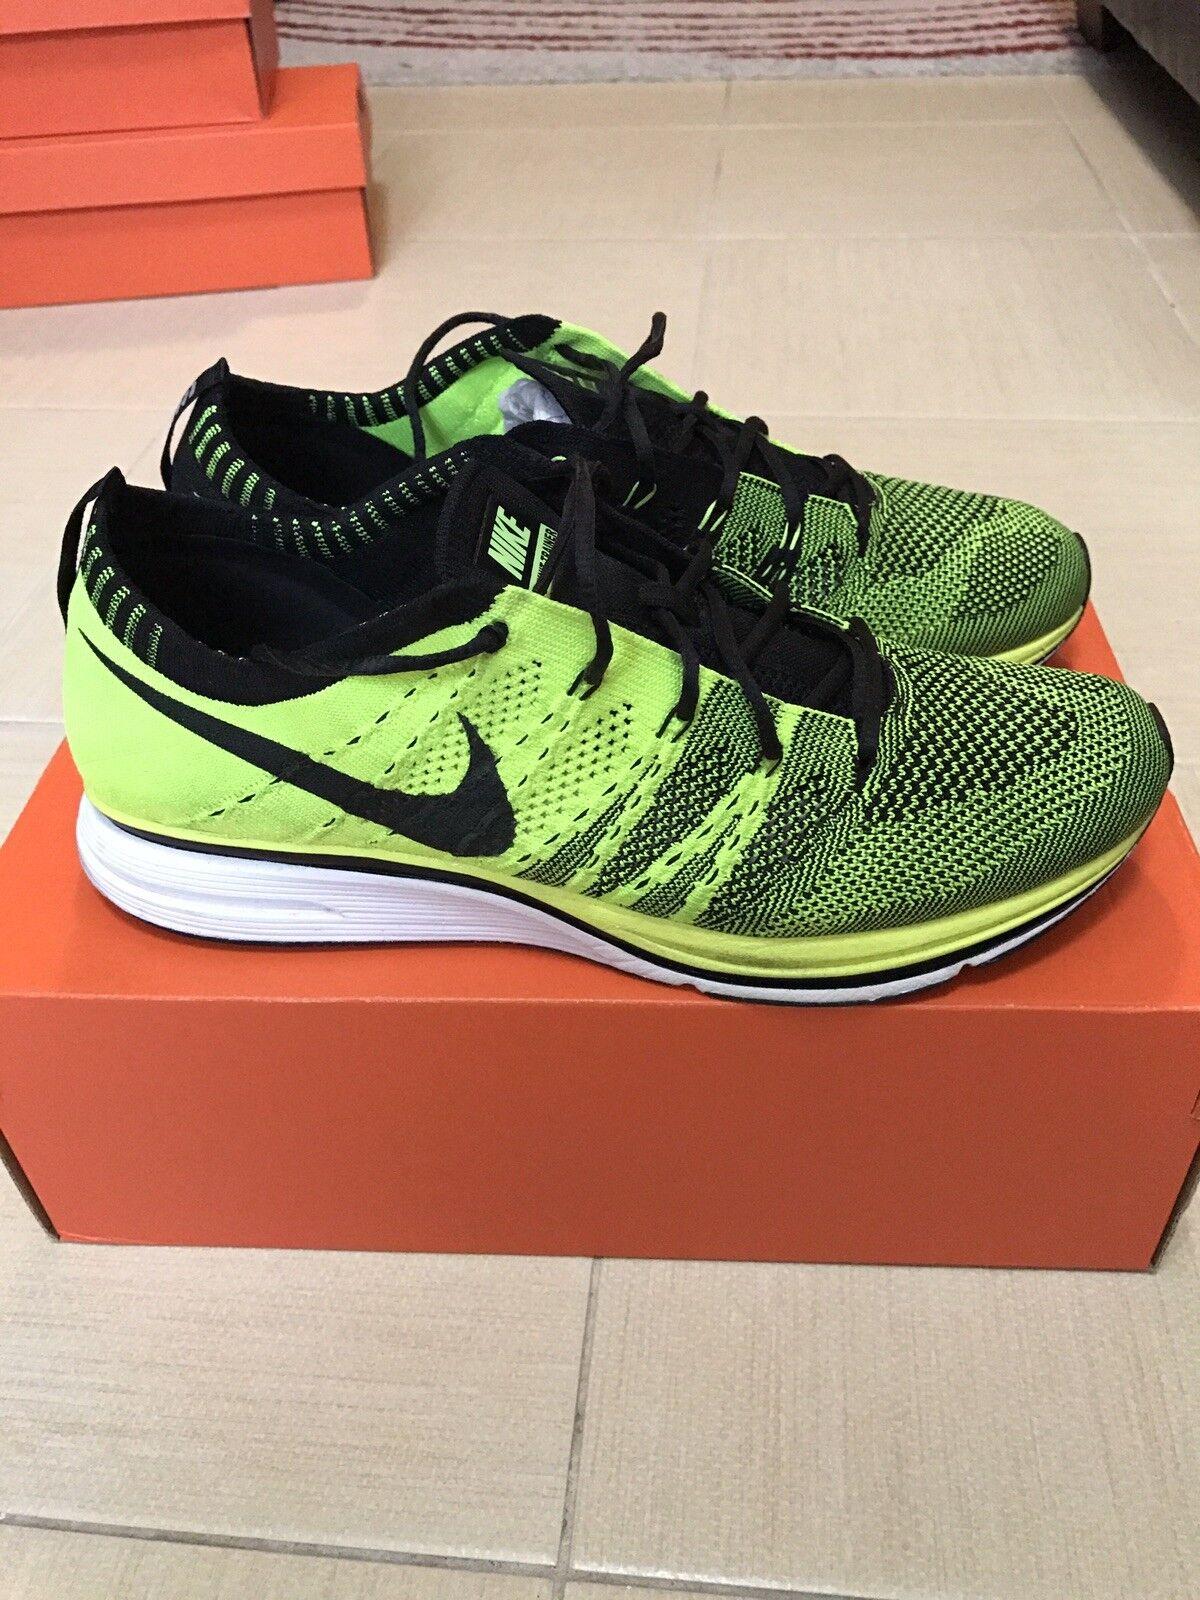 2012 Nike Flyknit Trainer Racer Volt Black Unpadded Olympics 532984-700 size 9